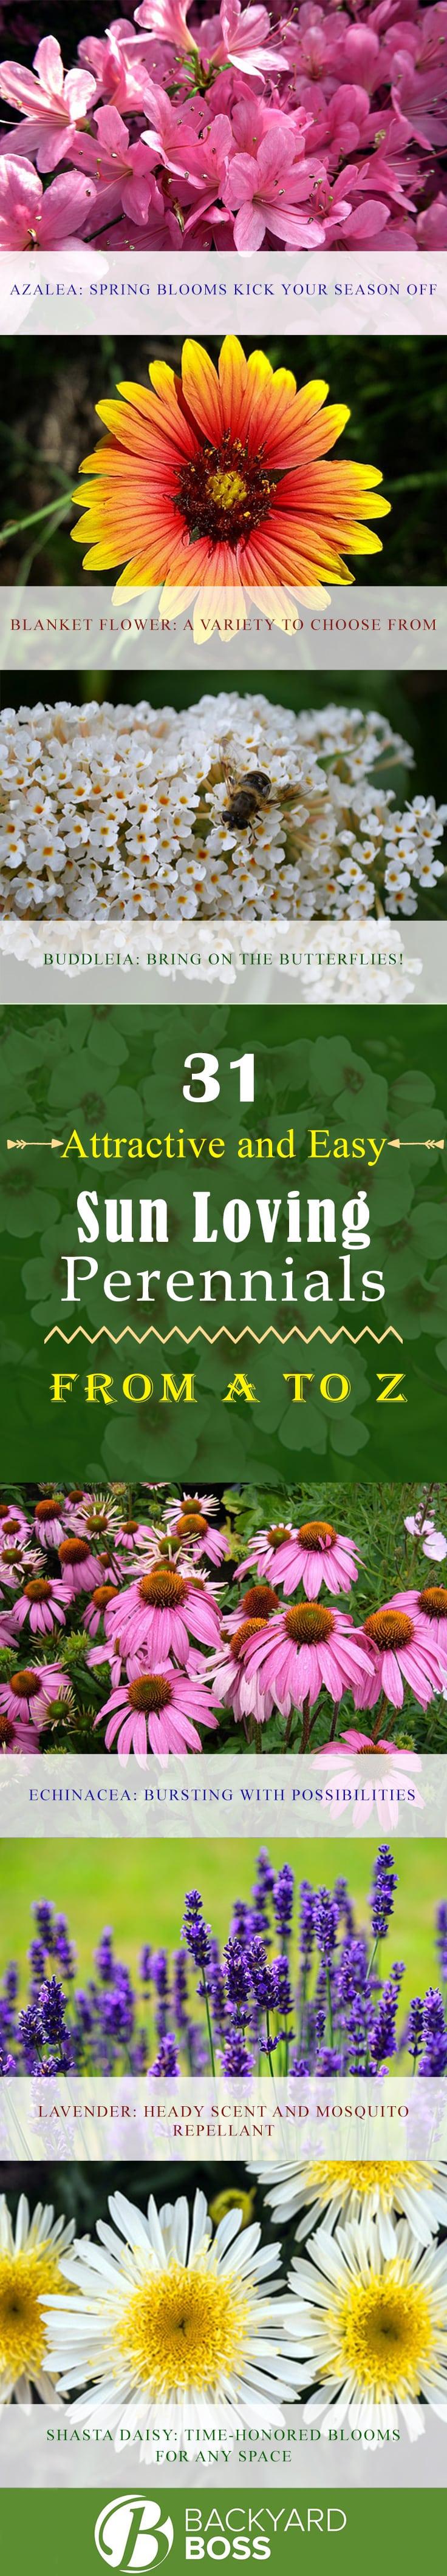 31 Attractive And Easy Sun Loving Perennials